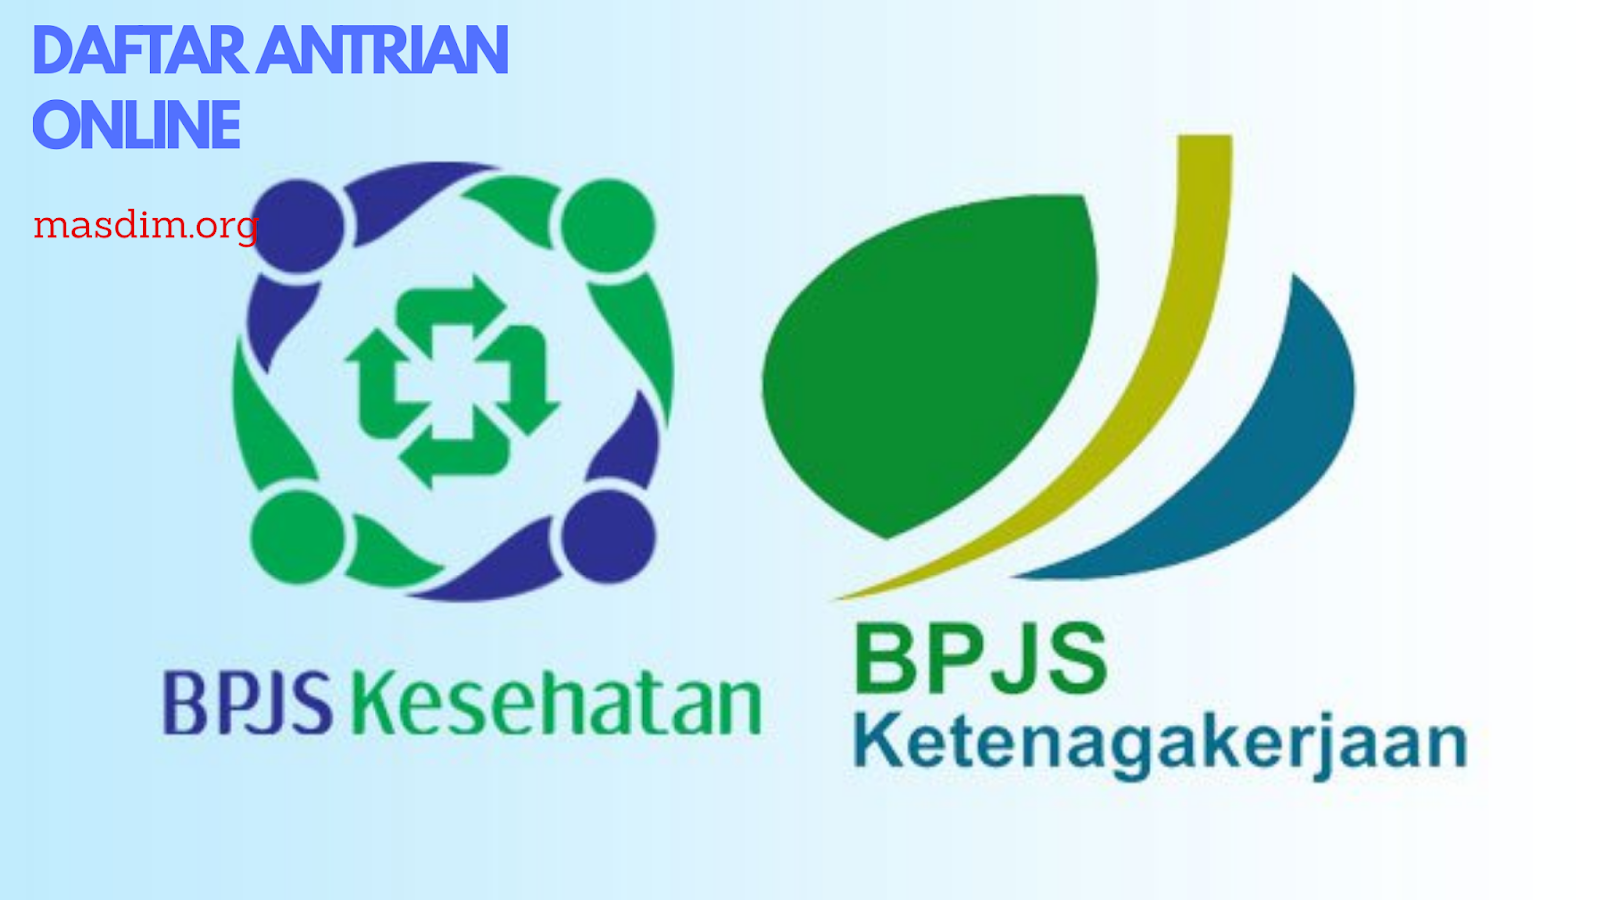 Daftar online bpjs ketenagakerjaan